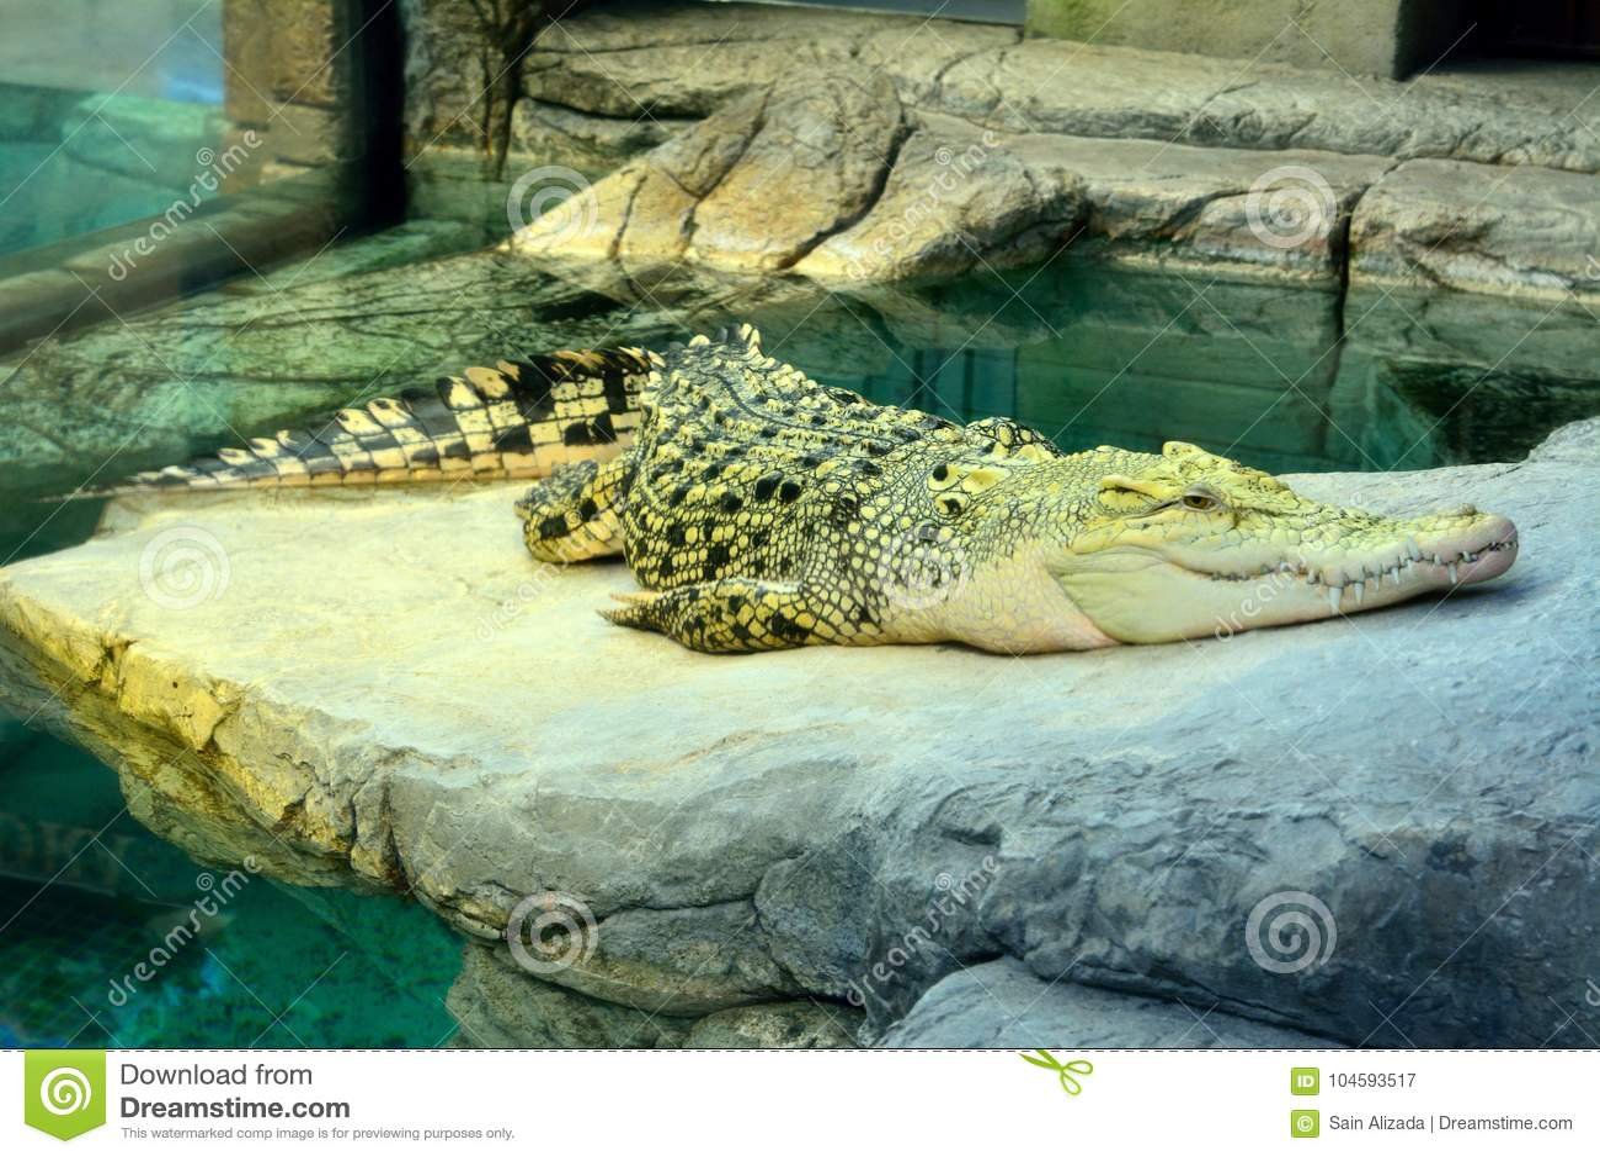 Gouden krokodil, een hybride van Zoutwater en Siamese Krokodillen